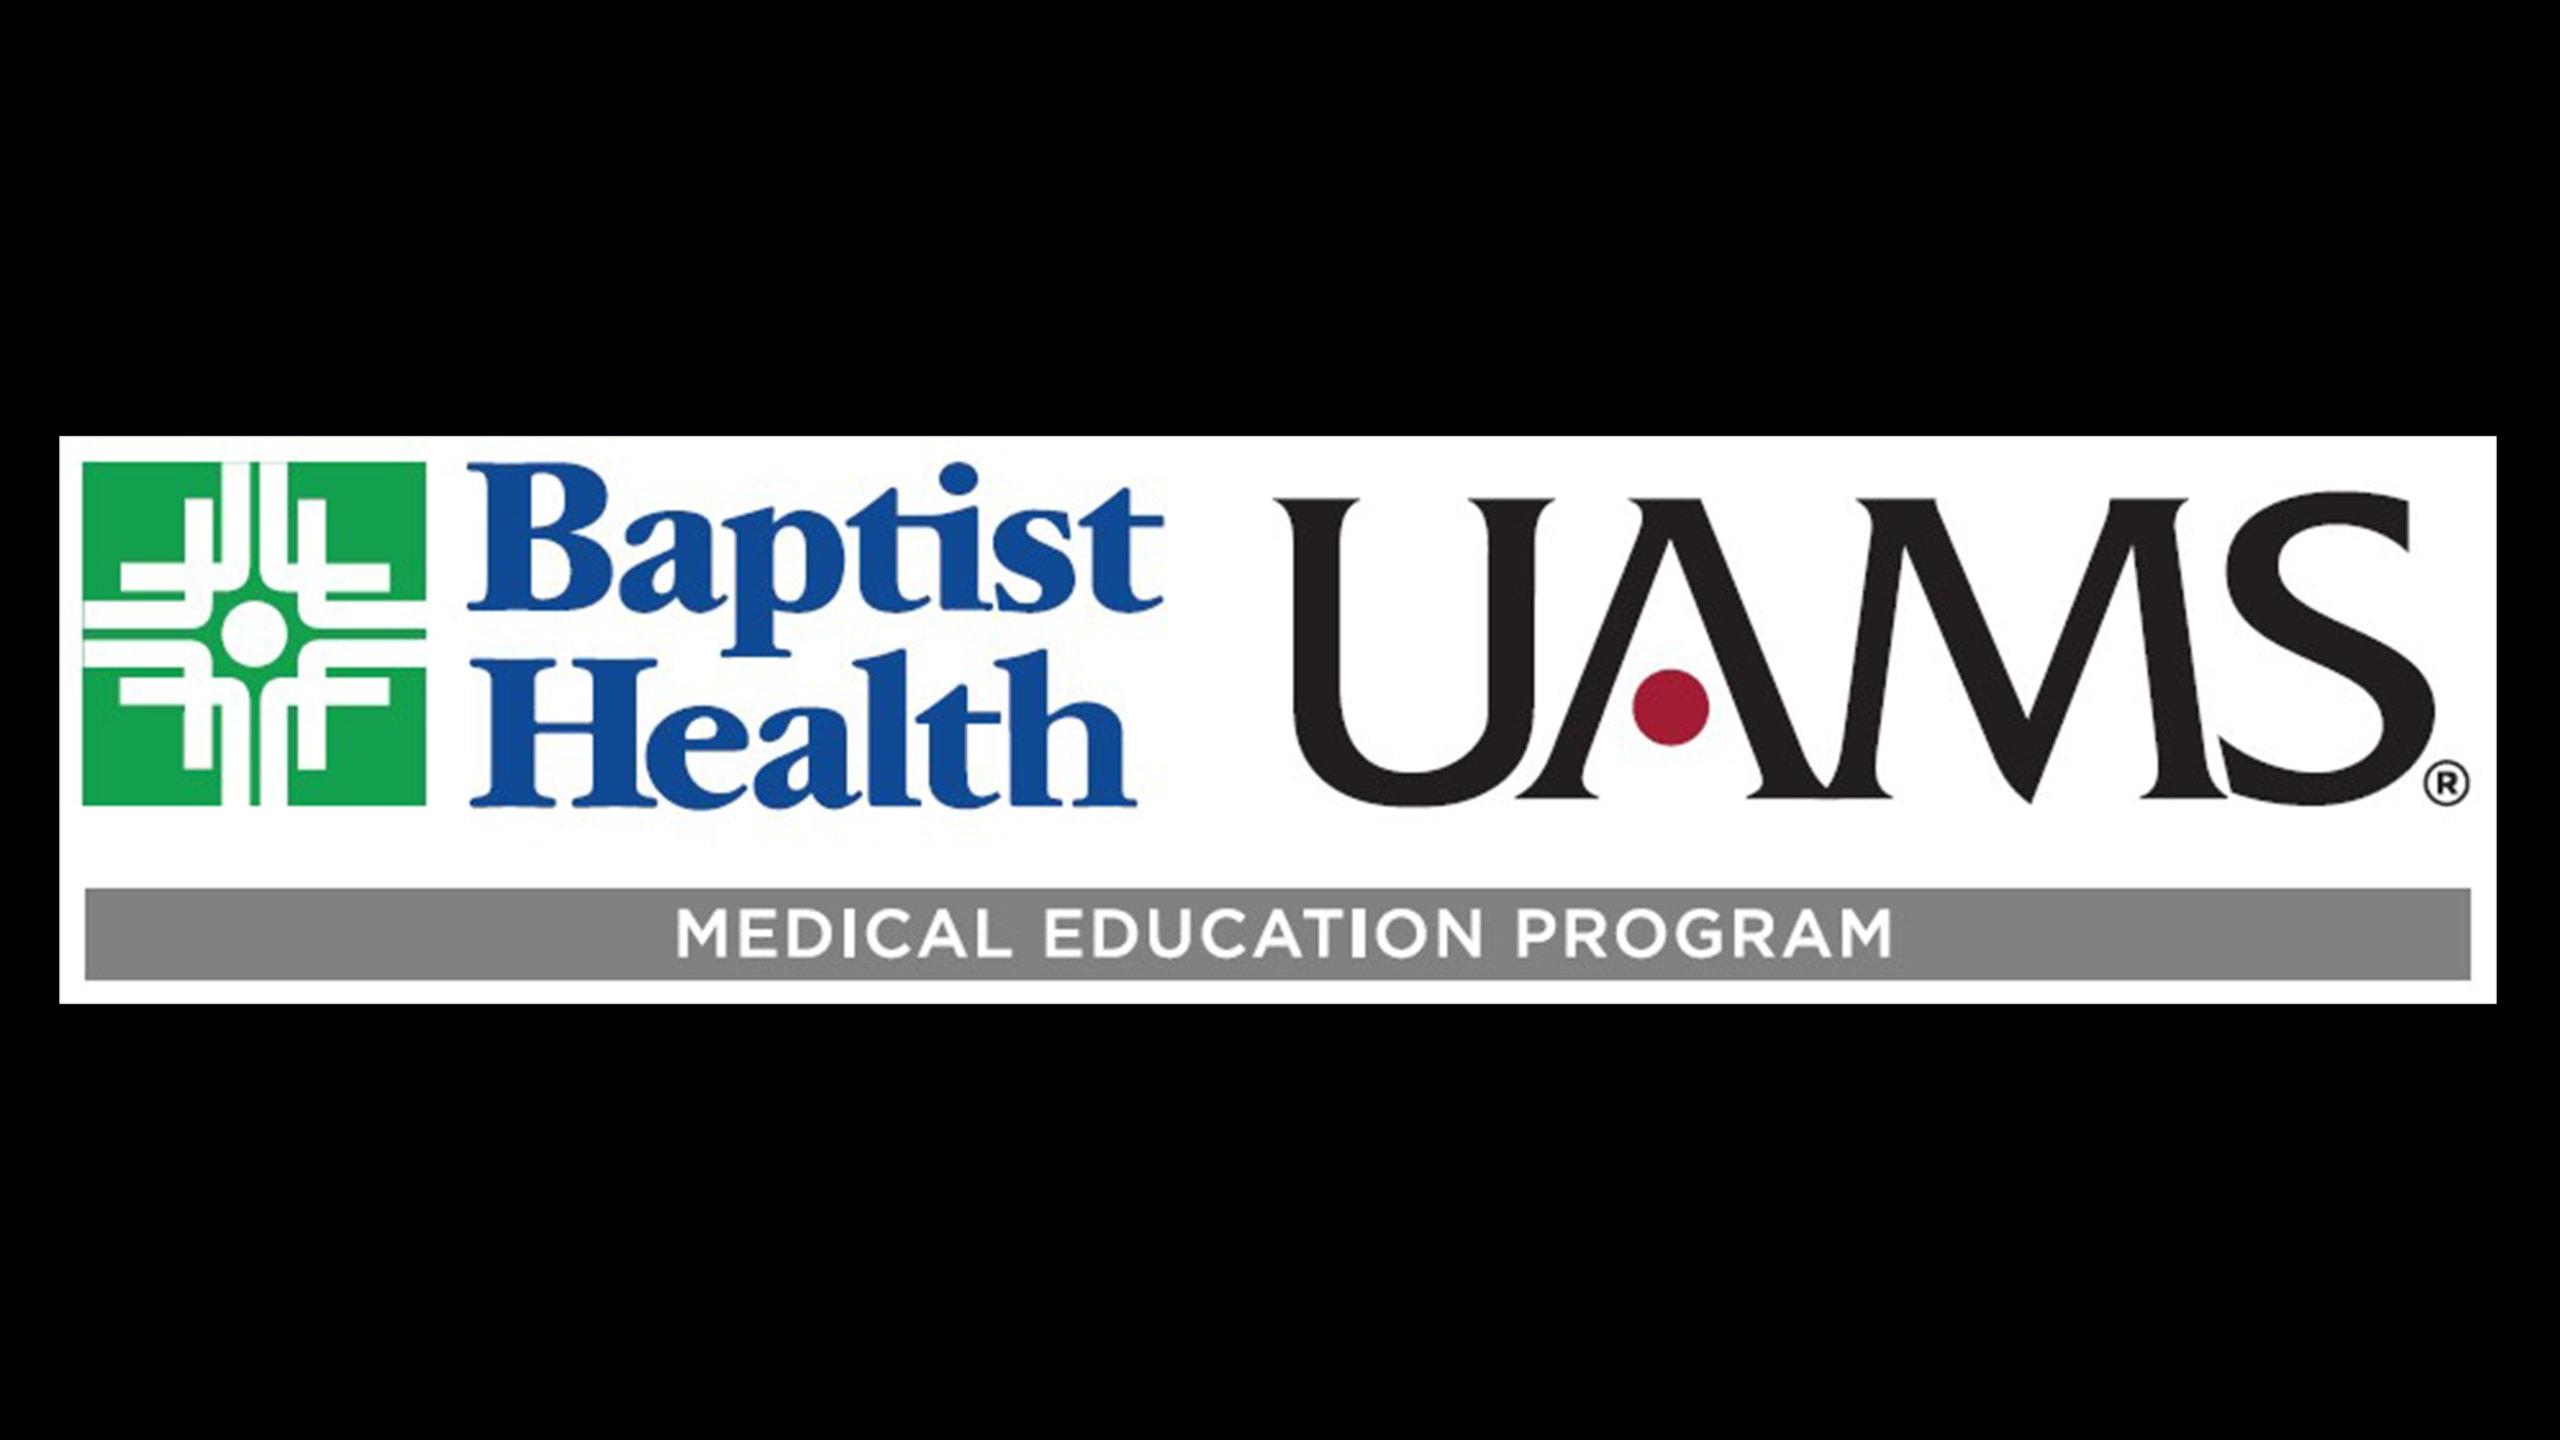 Baptist Health-UAMS logo